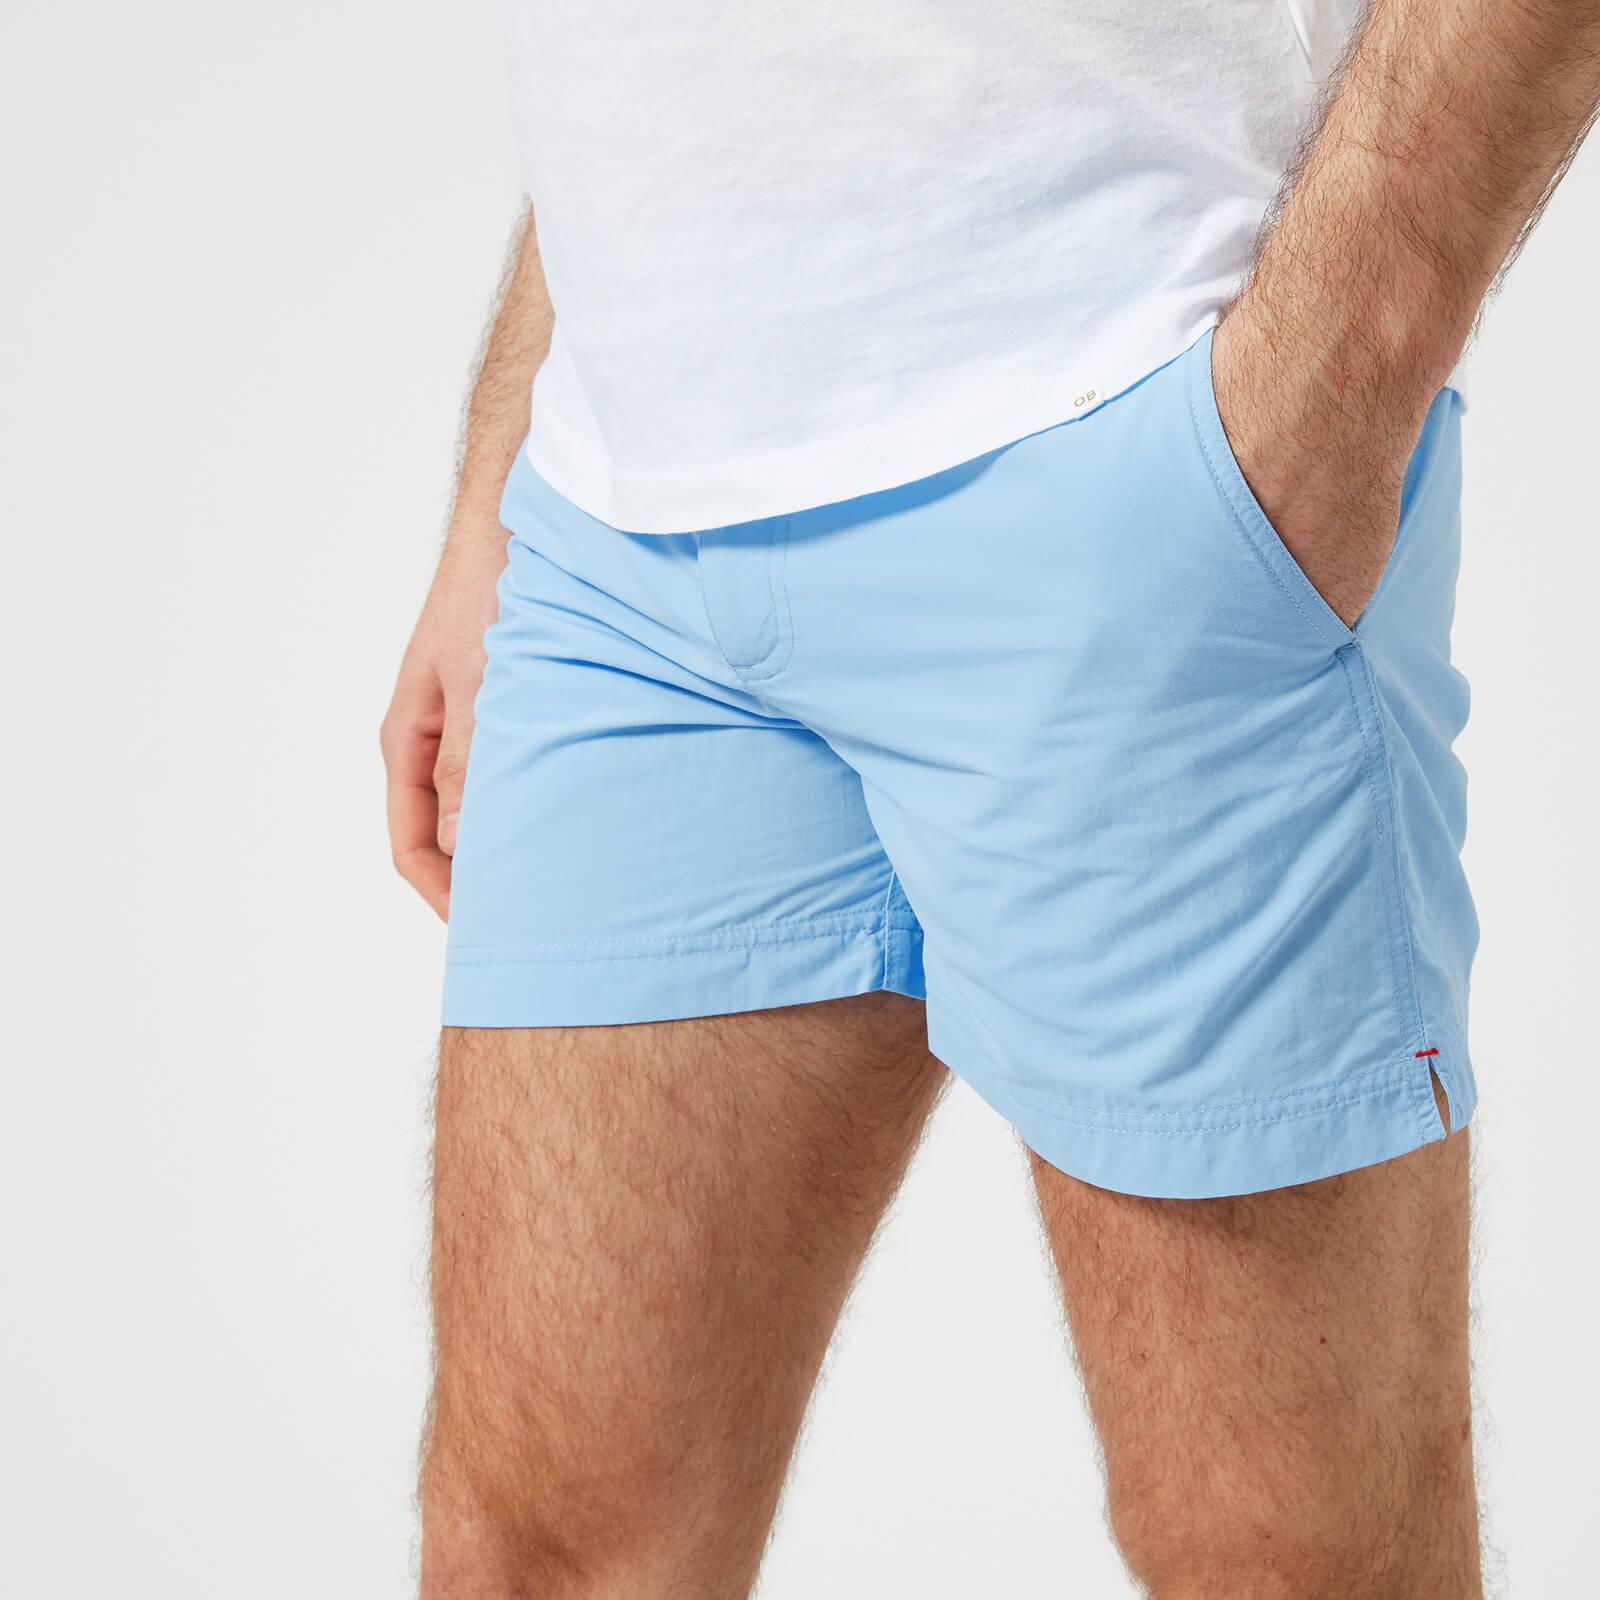 dc7f540234 Orlebar Brown Men's Setter Swim Shorts - Powder Blue - Free UK Delivery  over £50